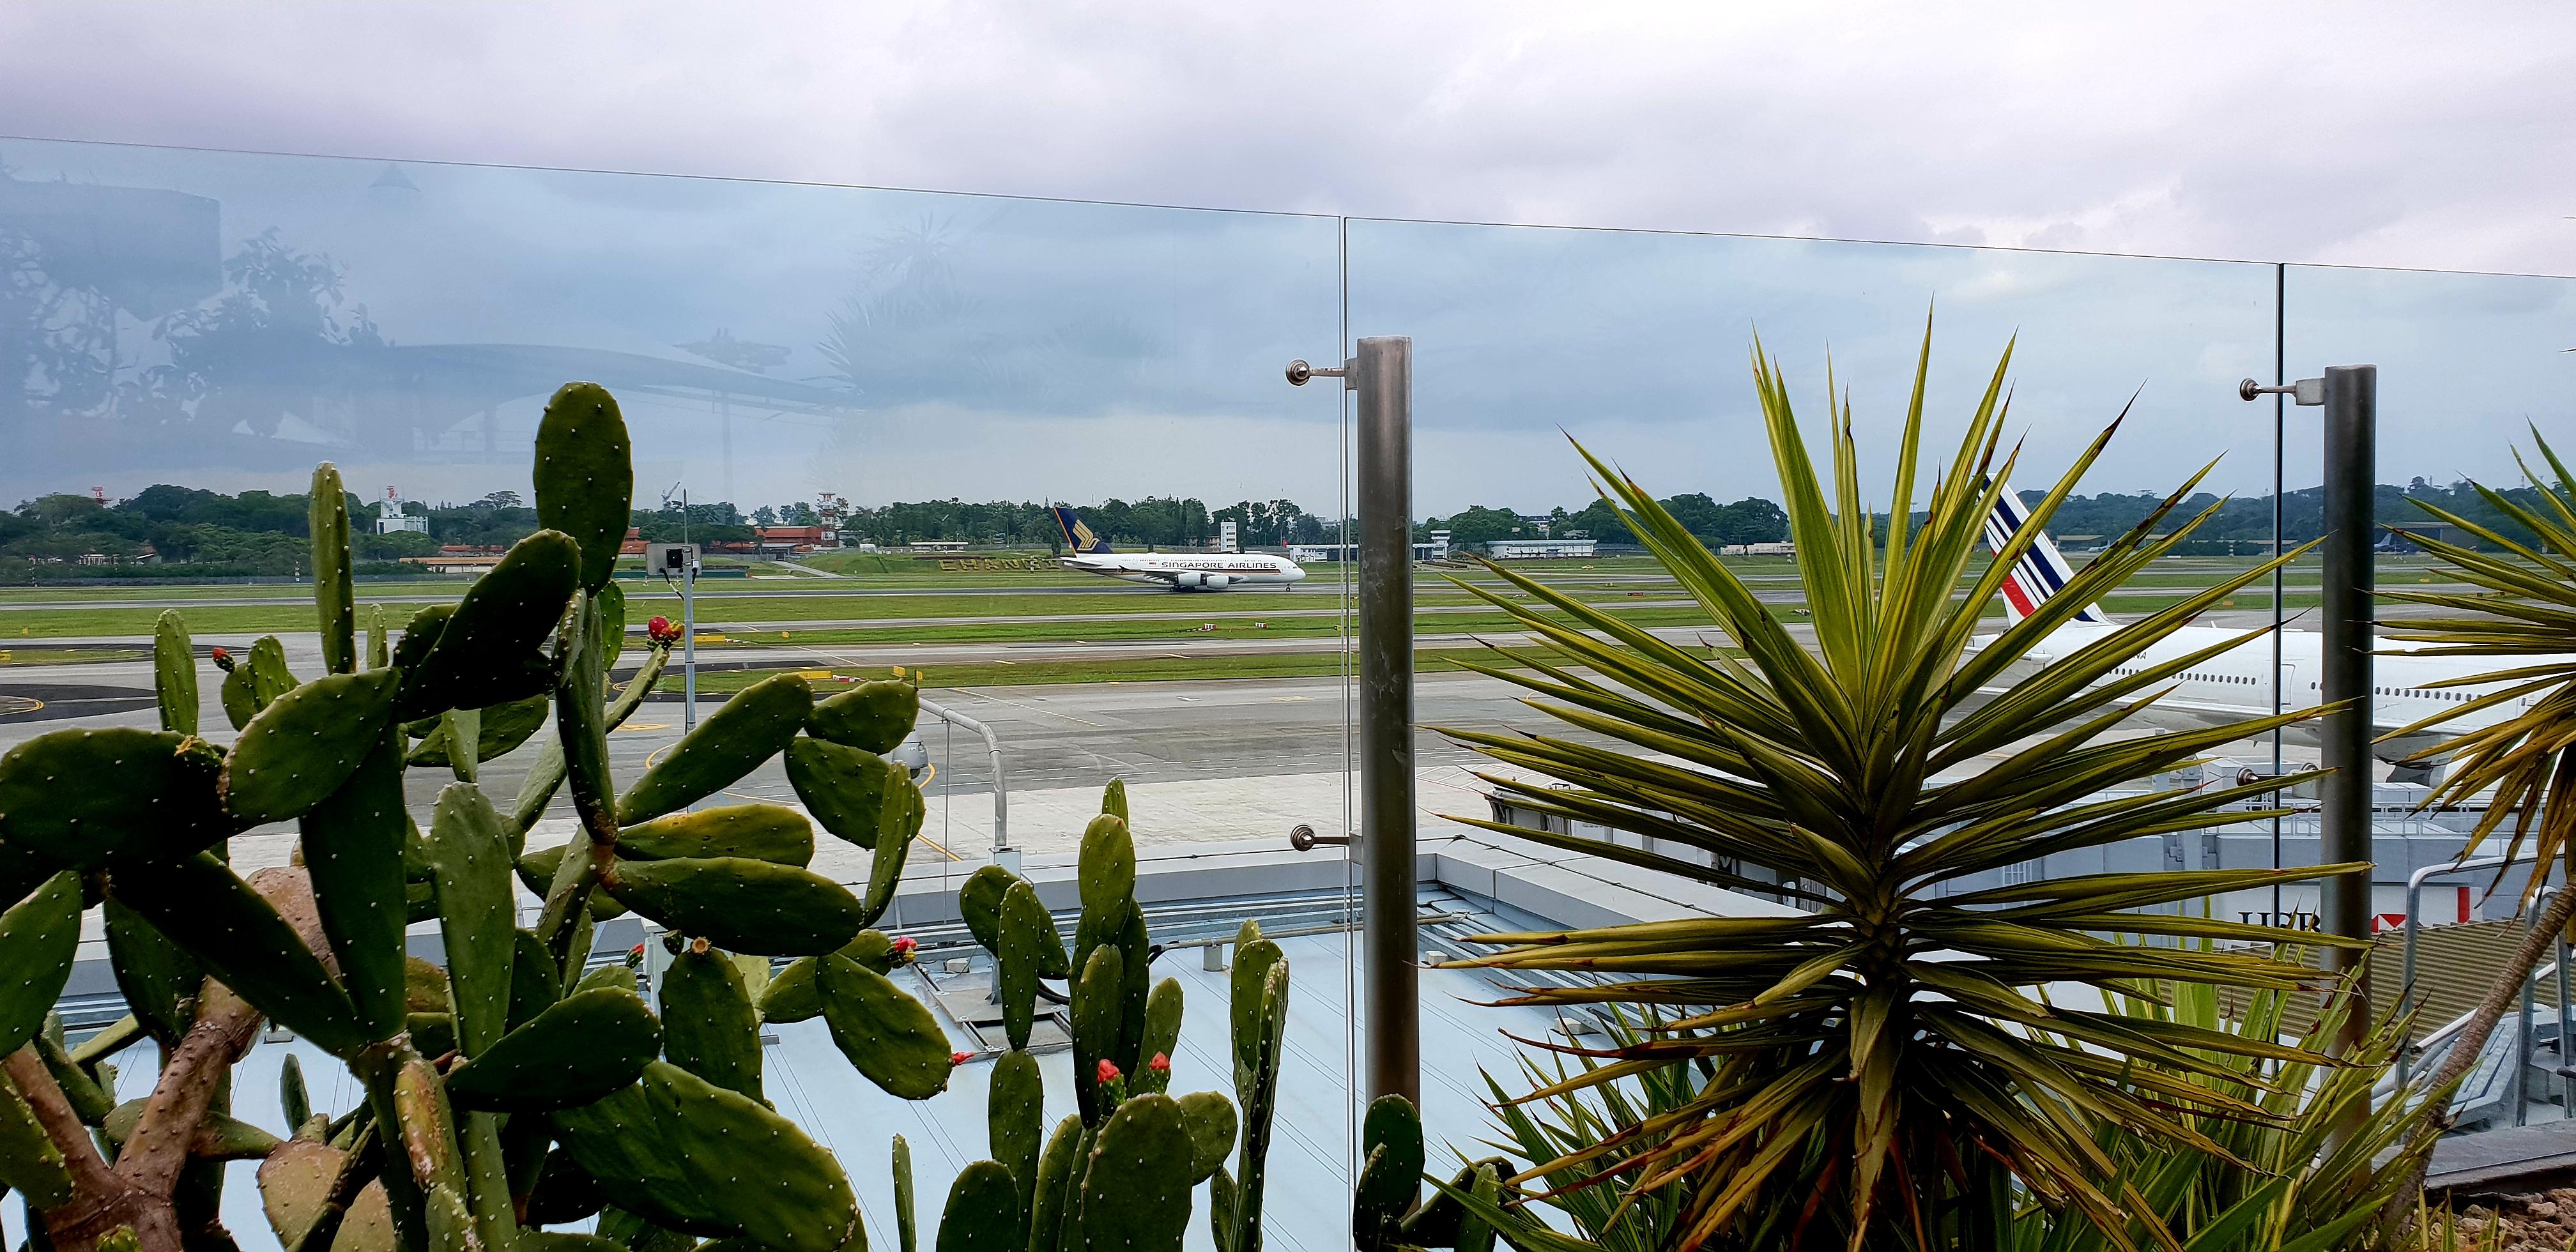 Cactus Garden Changi Airport